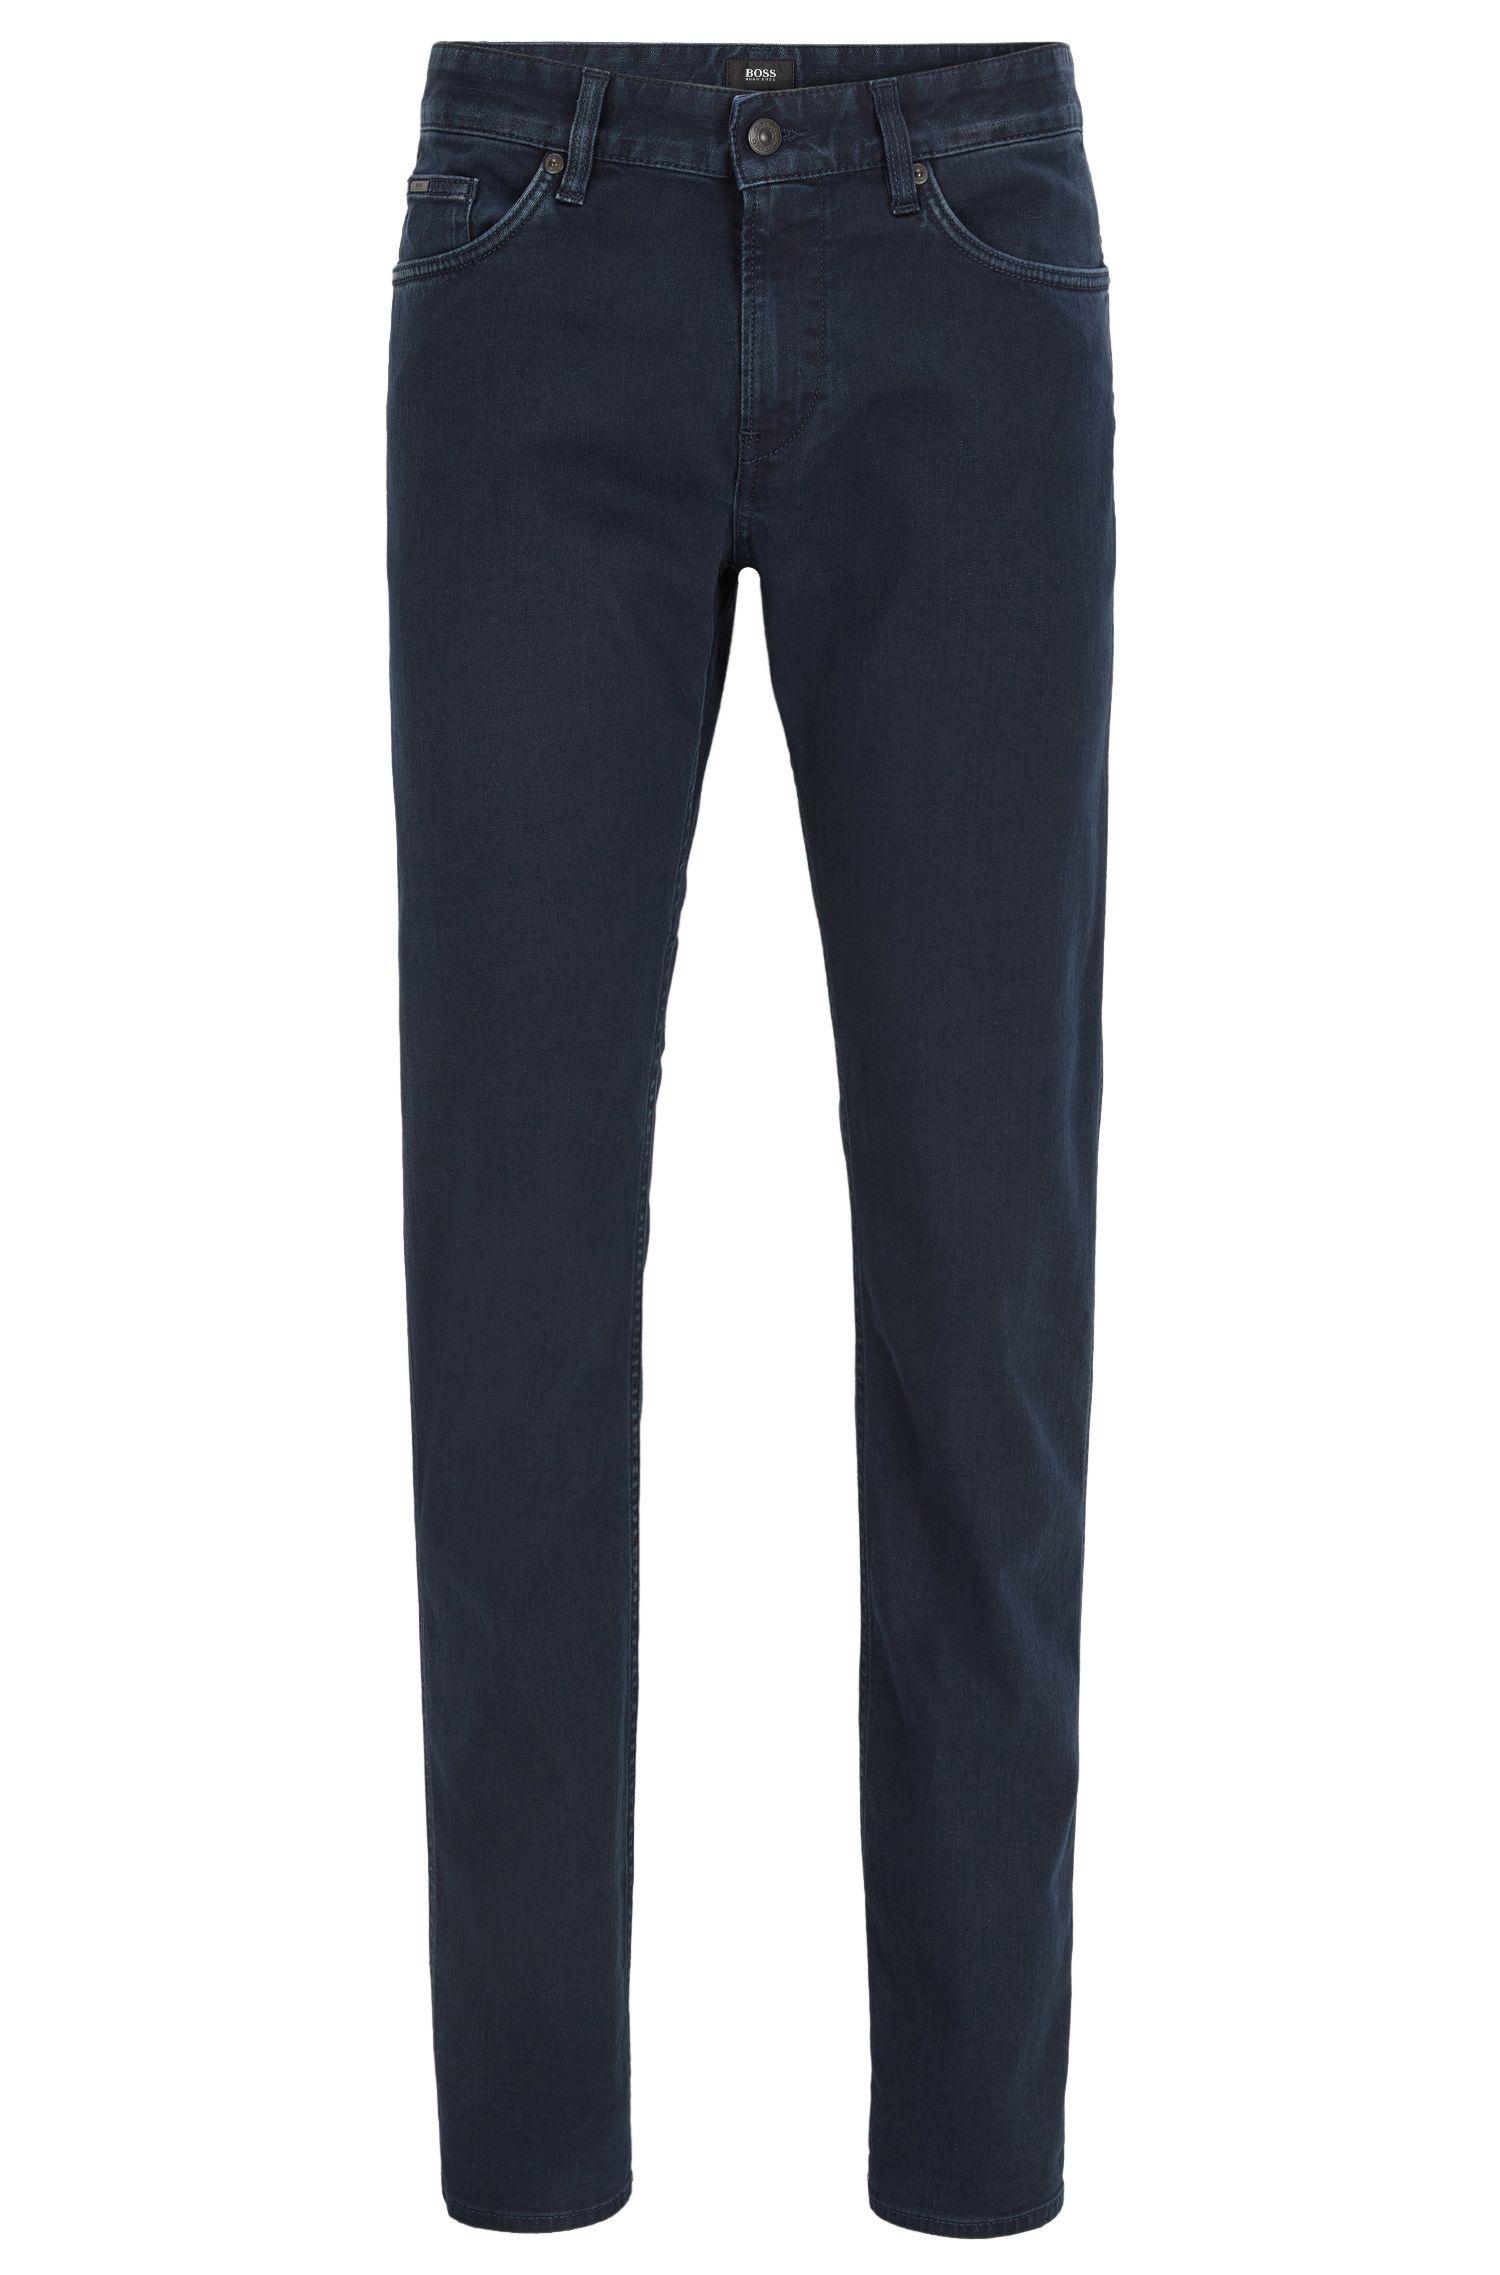 9.5 oz Stretch Cotton Jeans, Slim Fit | Delaware